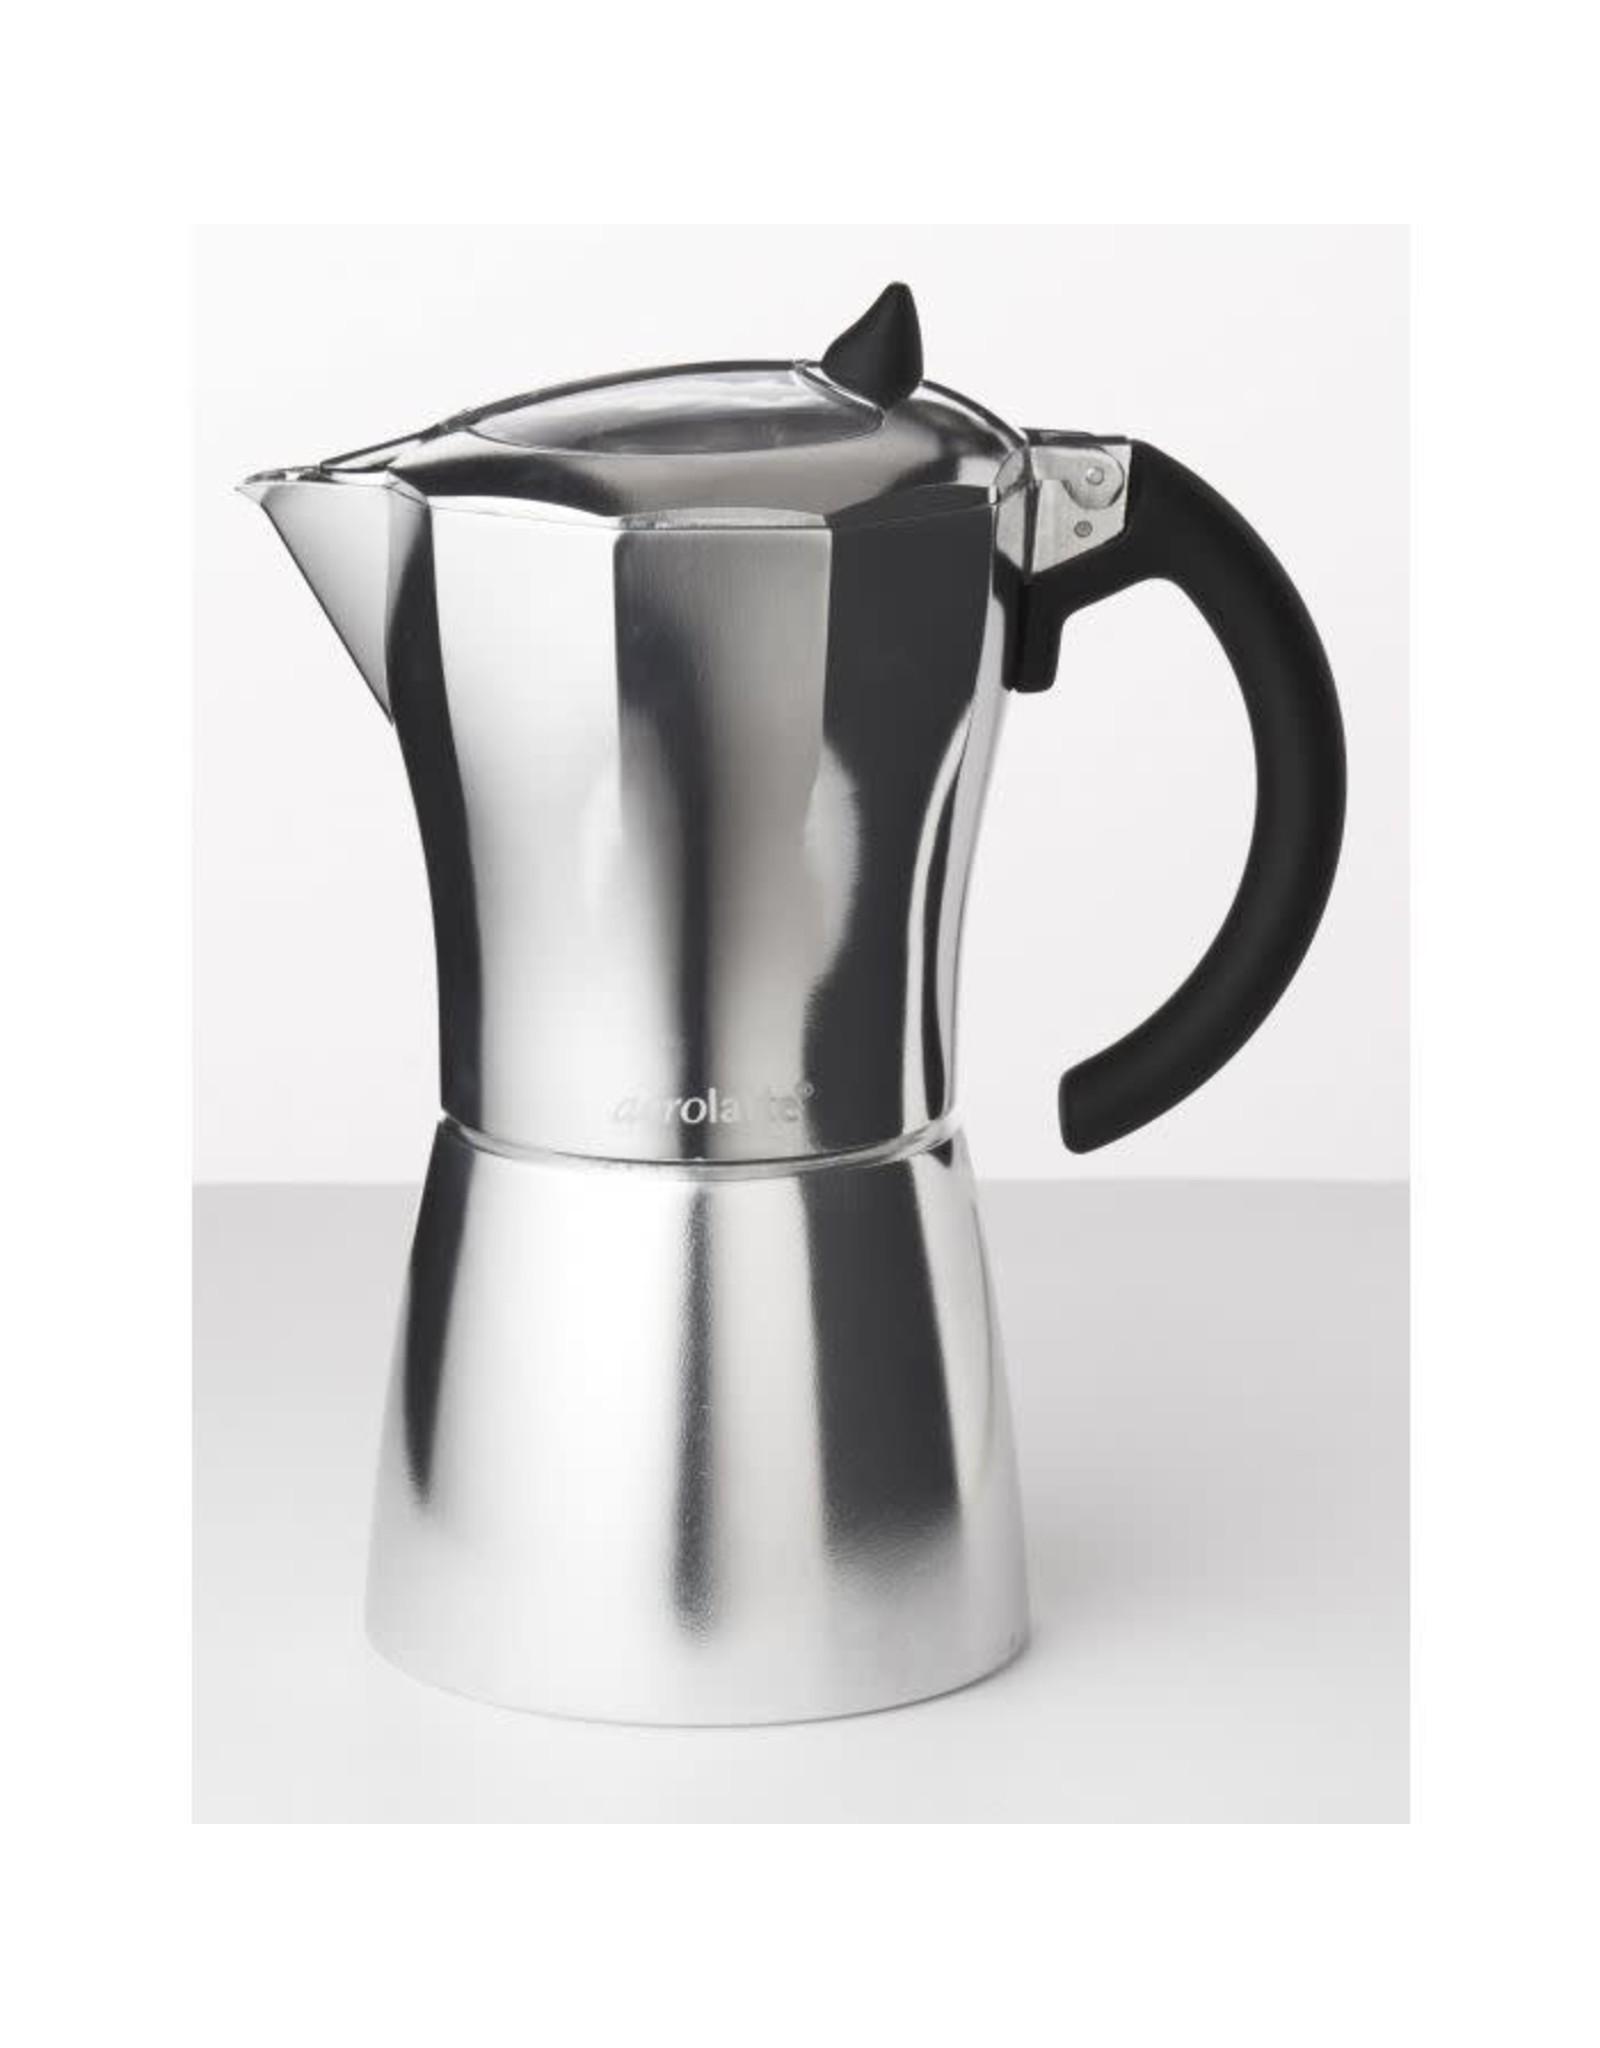 HIC-ESPRESSO POT 6 CUP